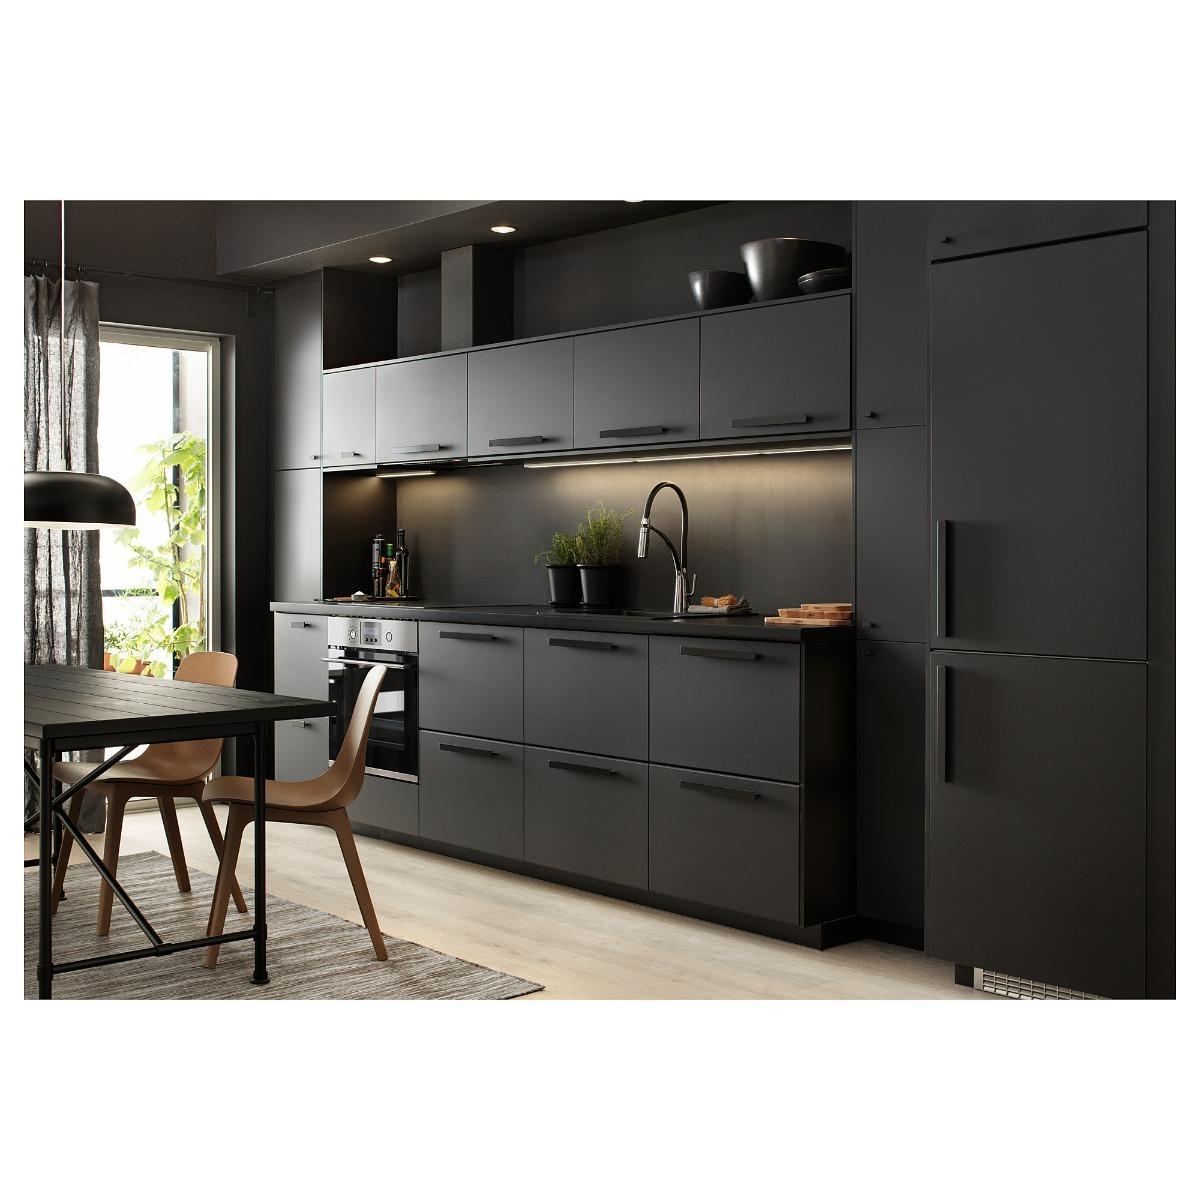 Excelente Precio Cocina Ikea Reino Unido Ideas - Ideas de Decoración ...